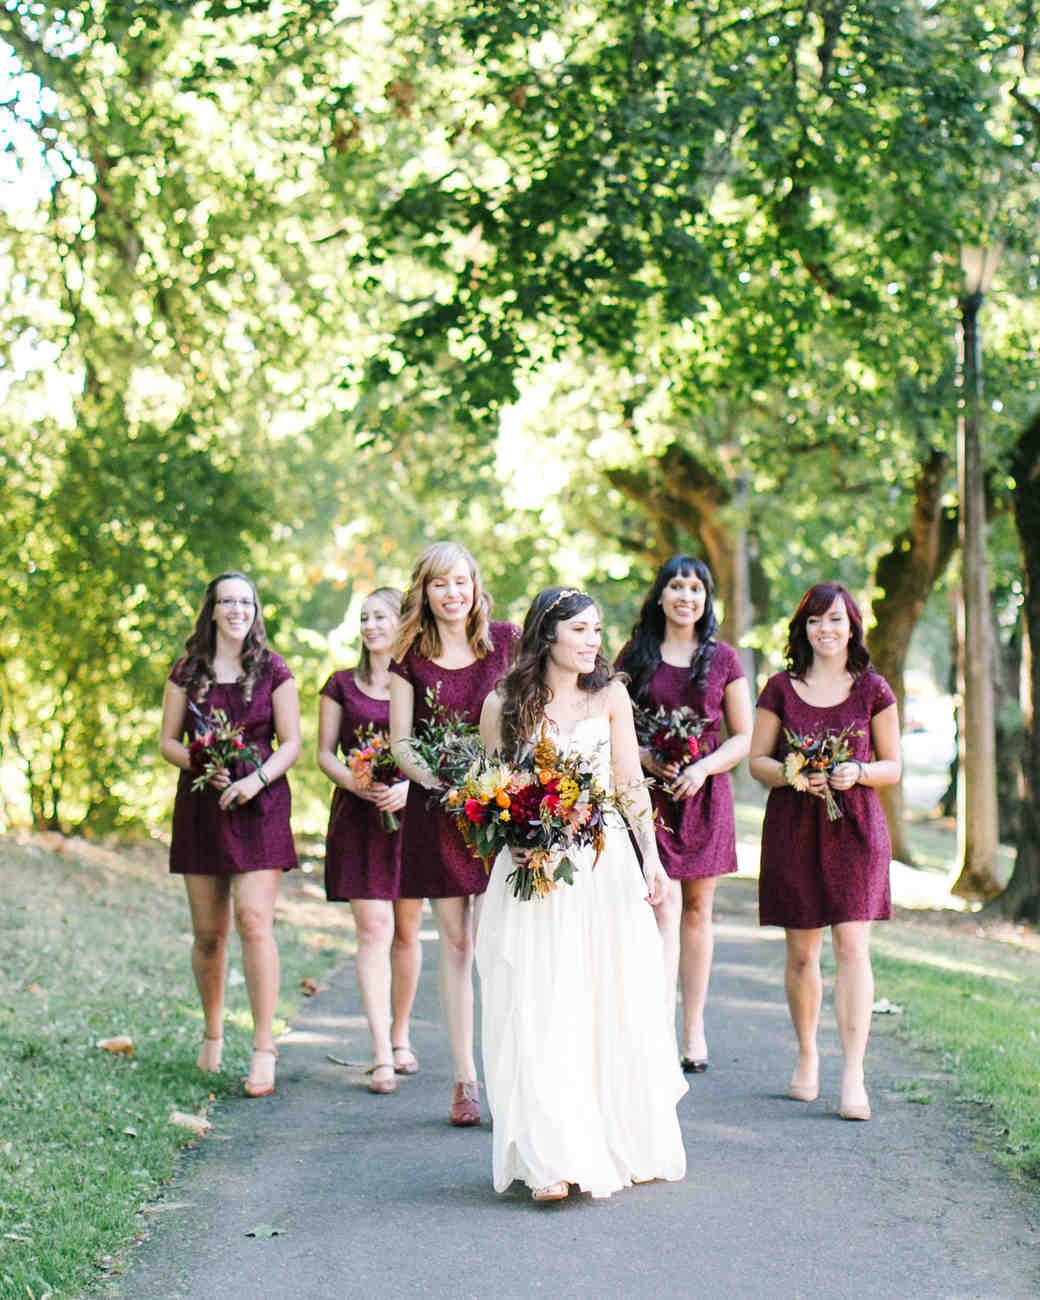 marguerita-aaron-wedding-bridesmaids-200-s111848-0214.jpg